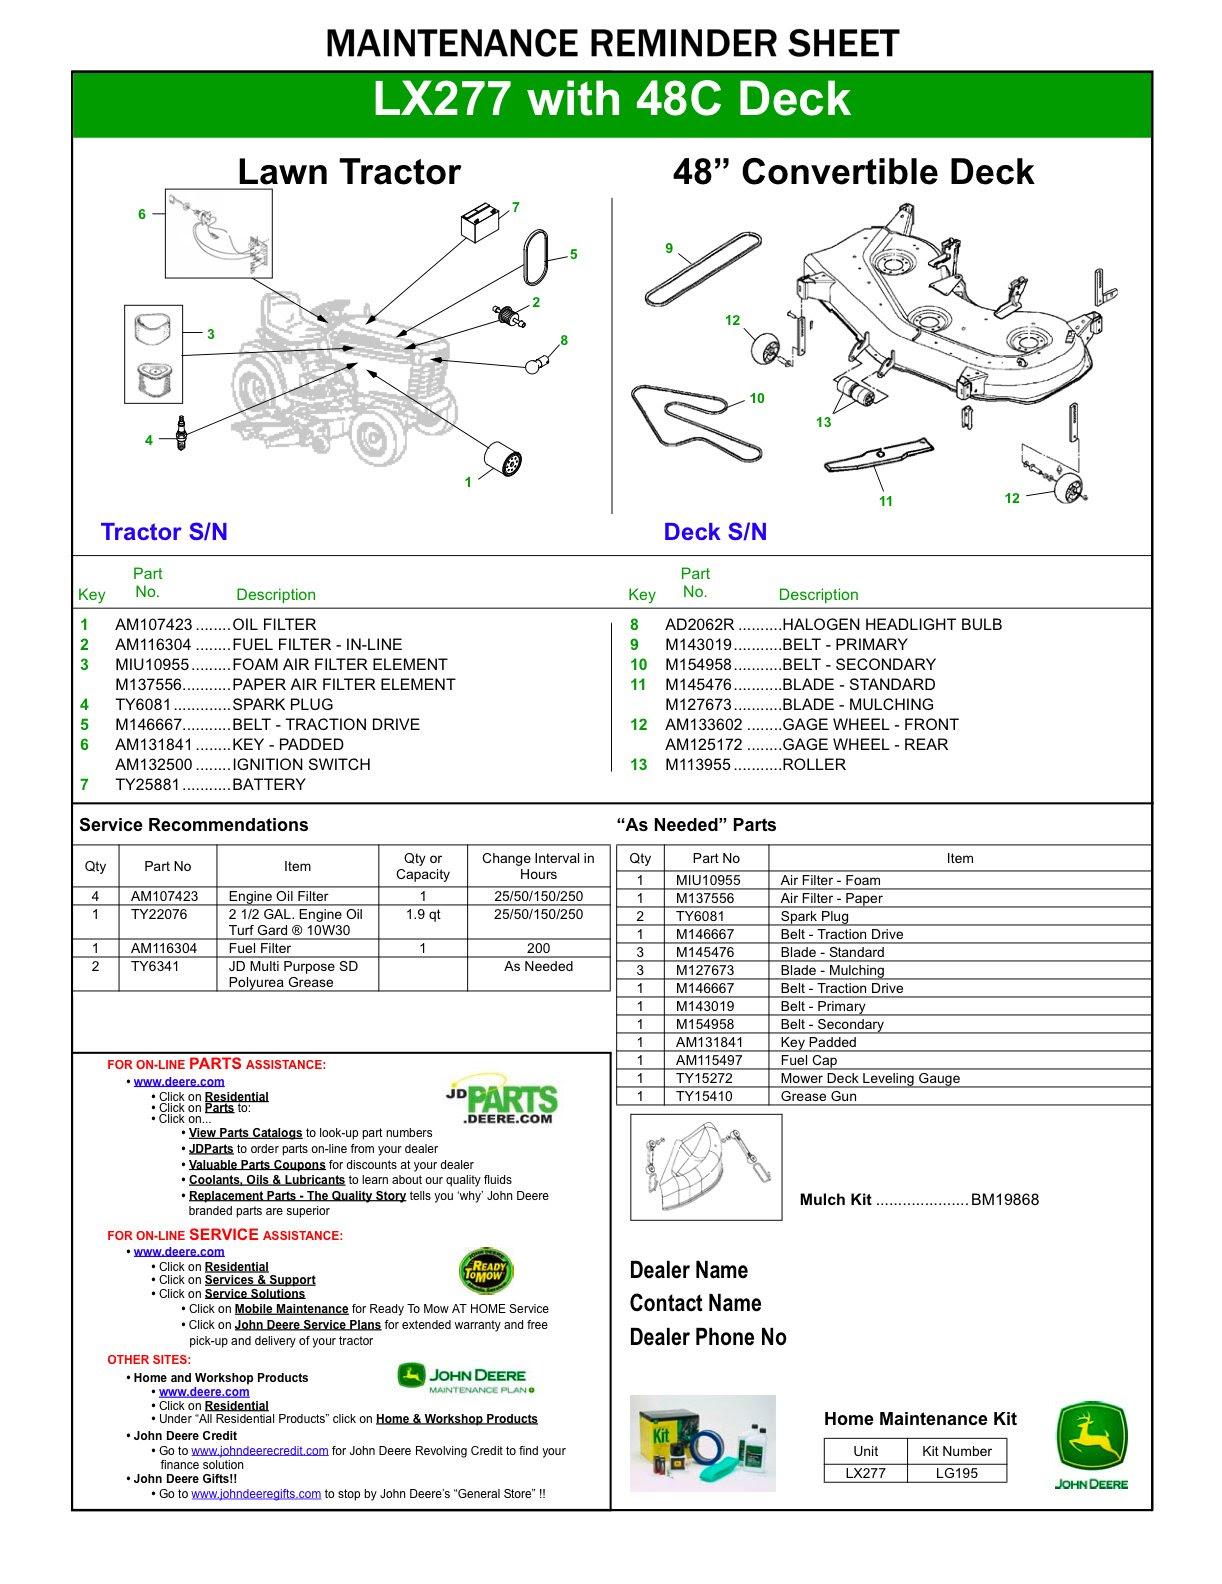 33 John Deere 48c Mower Deck Parts Diagram